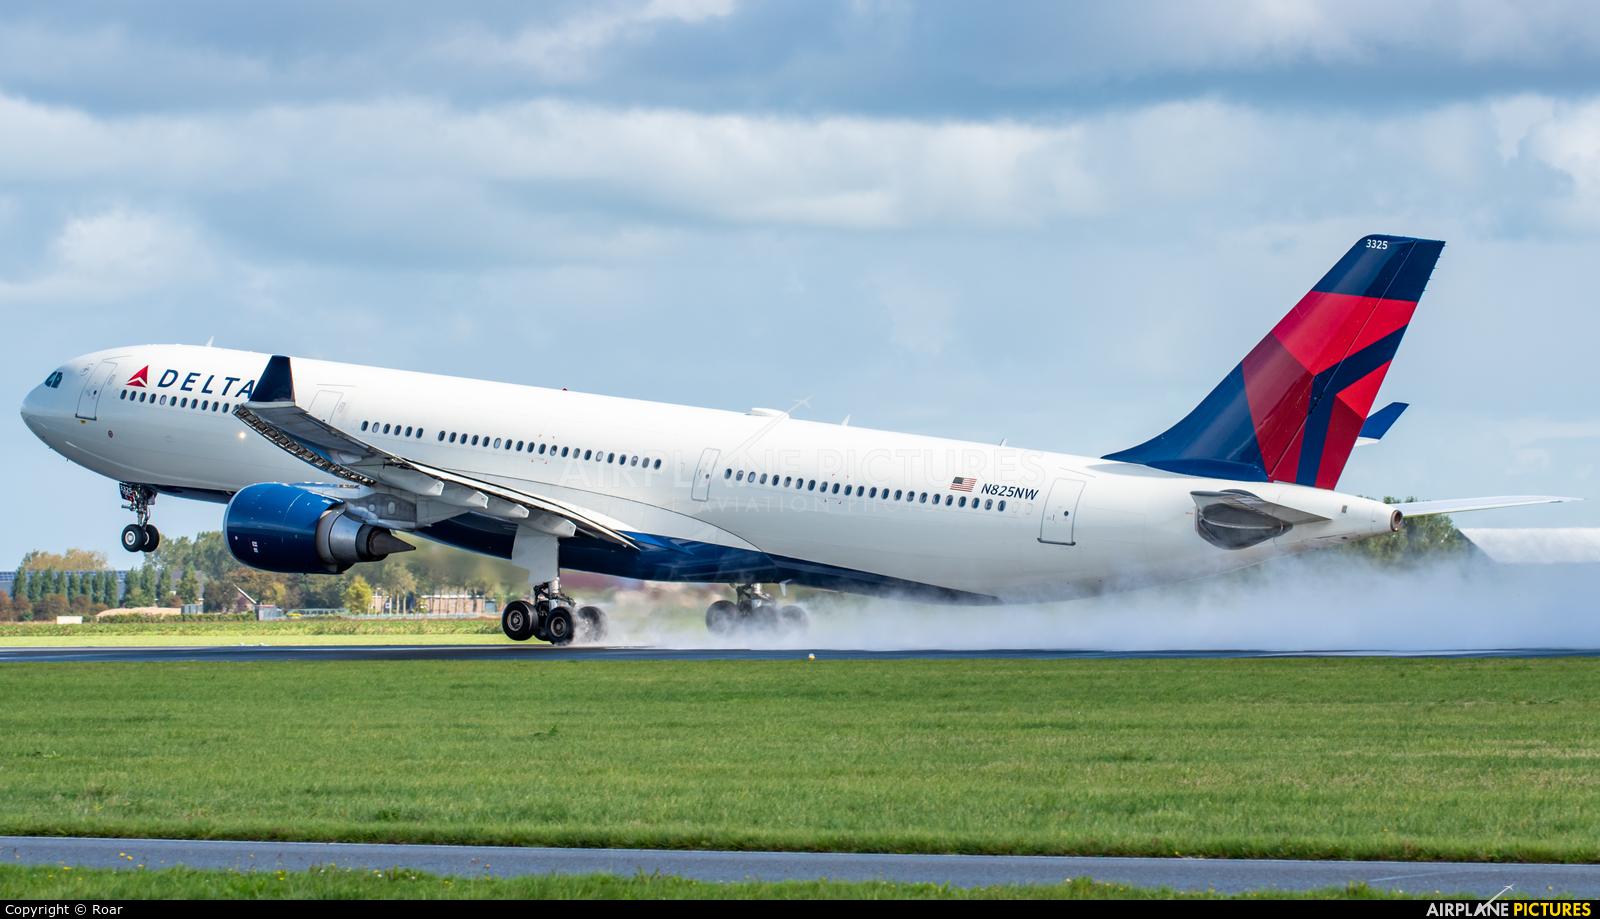 Delta Air Lines N825NW aircraft at Amsterdam - Schiphol